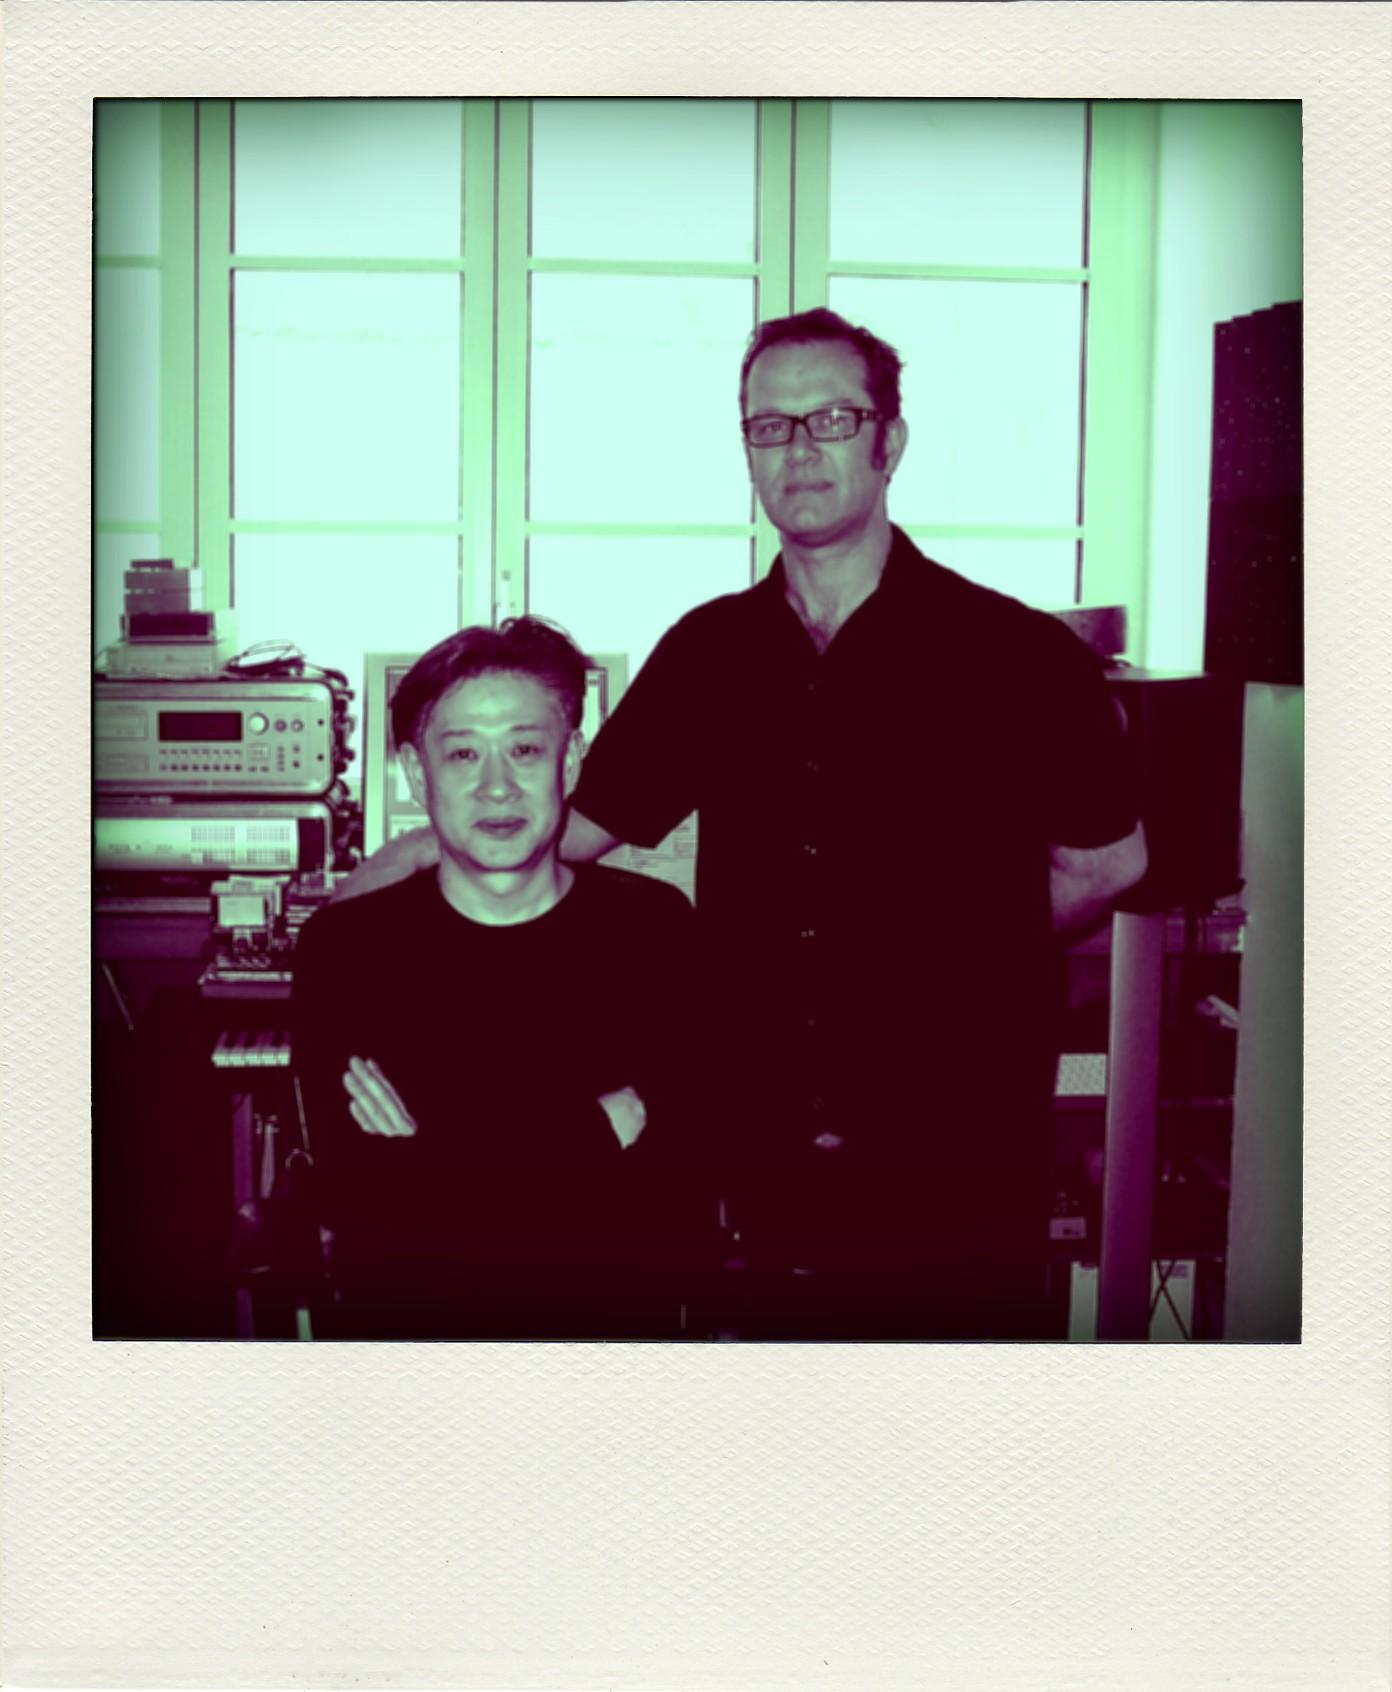 With Jun Miyake, Paris 2007